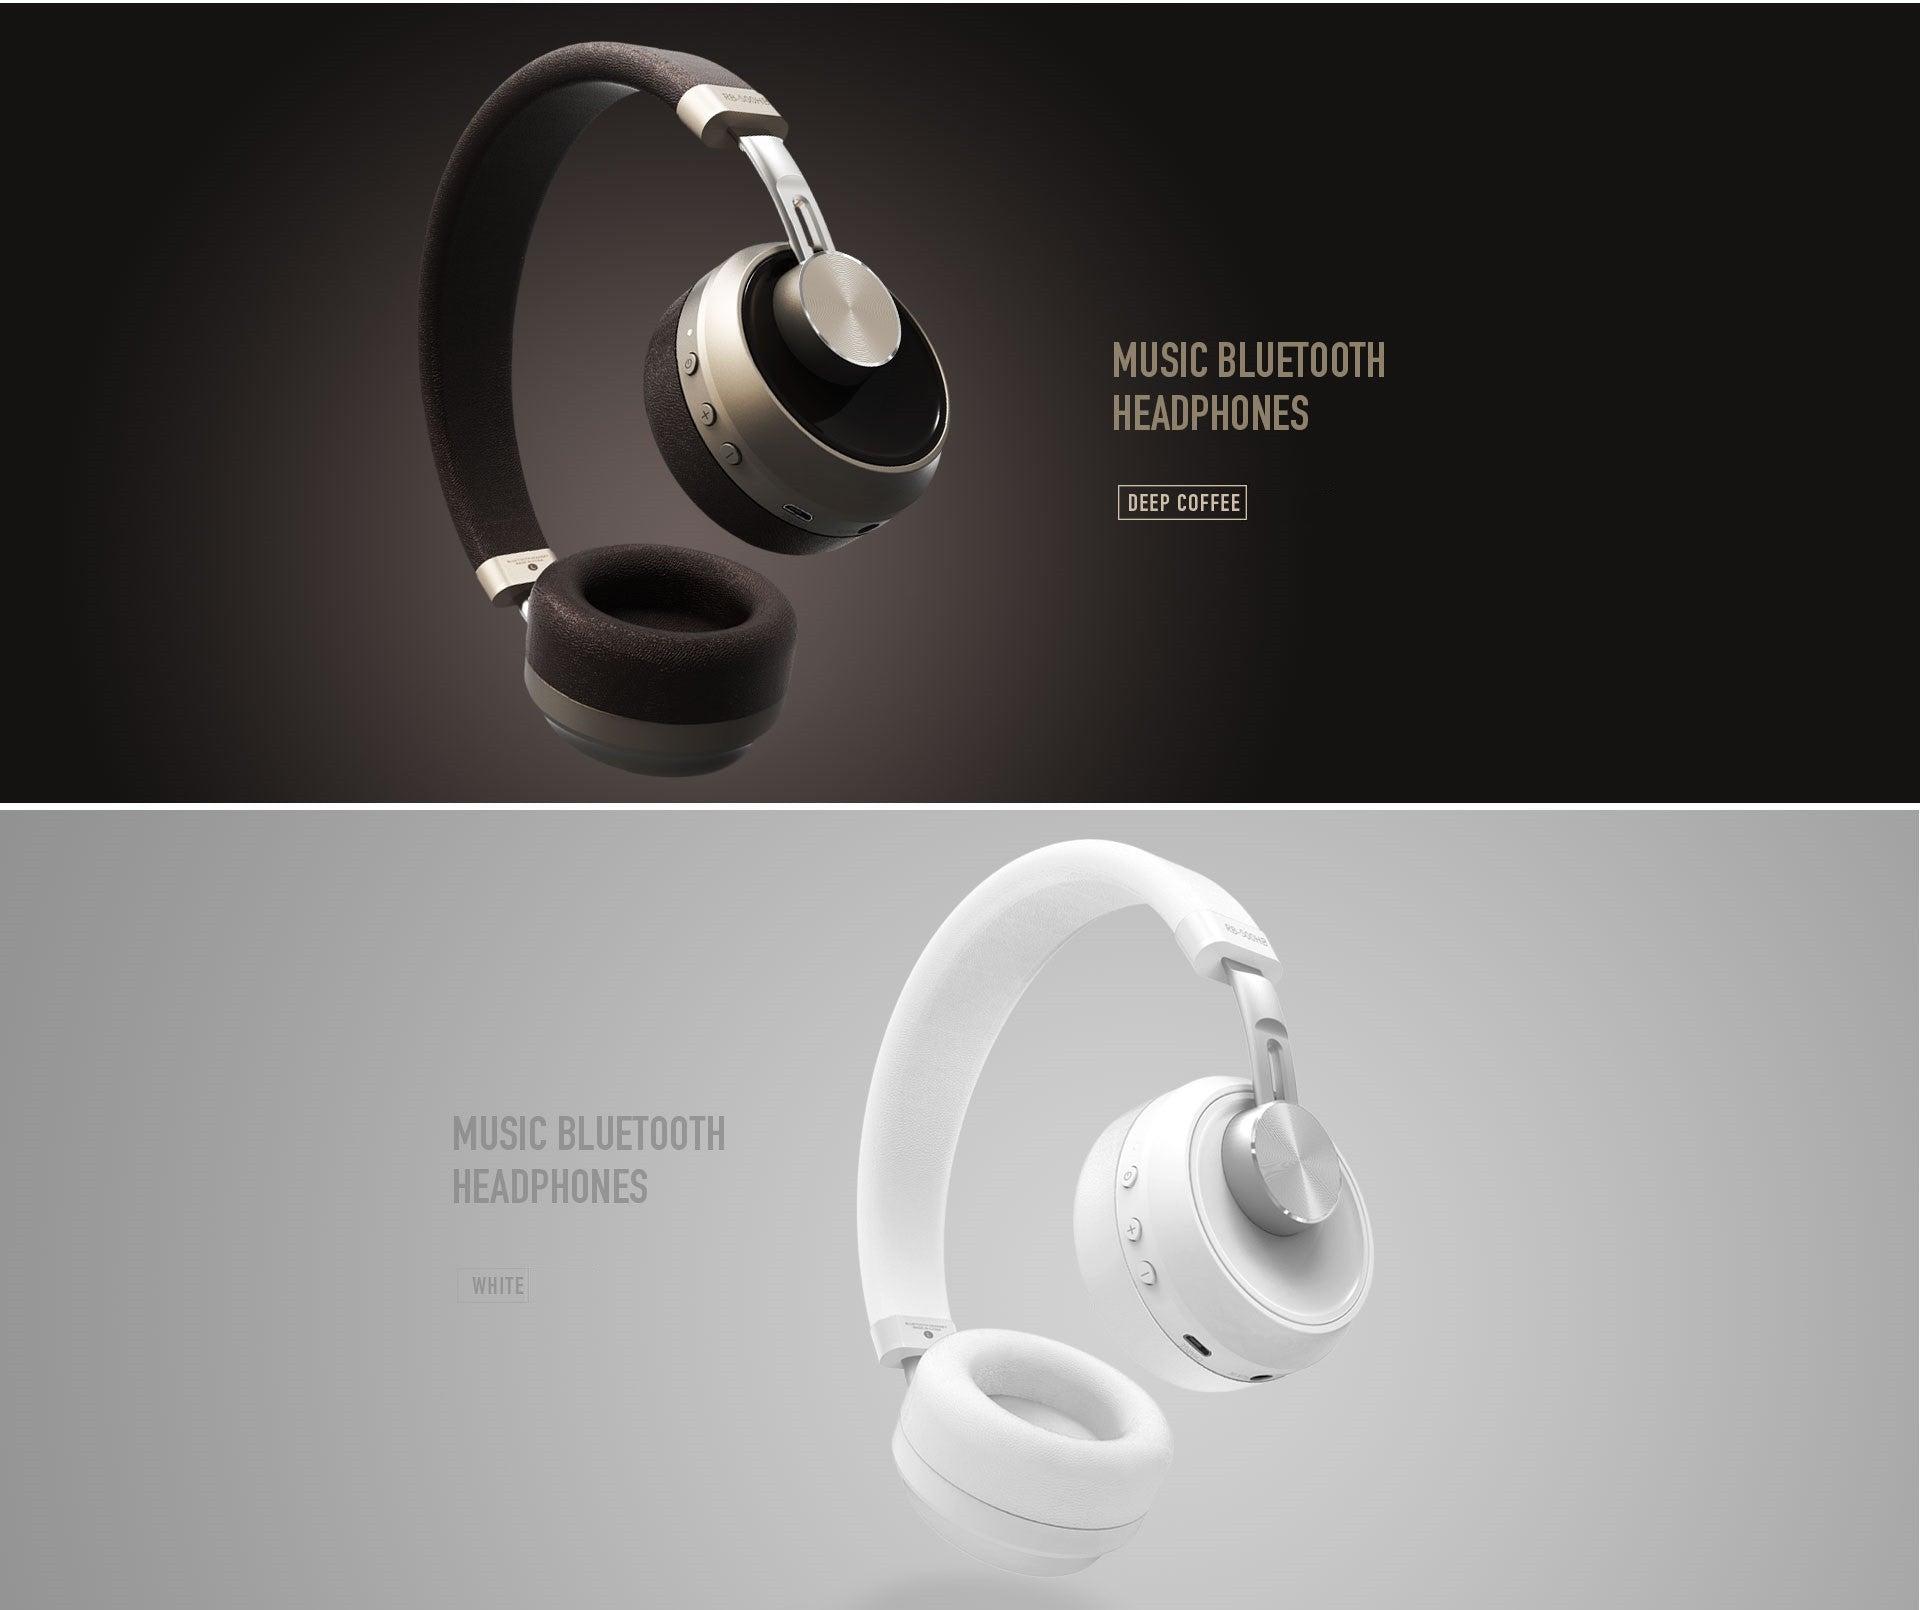 xiaomi wireless bluetooth 4.1 music sport earbuds manual